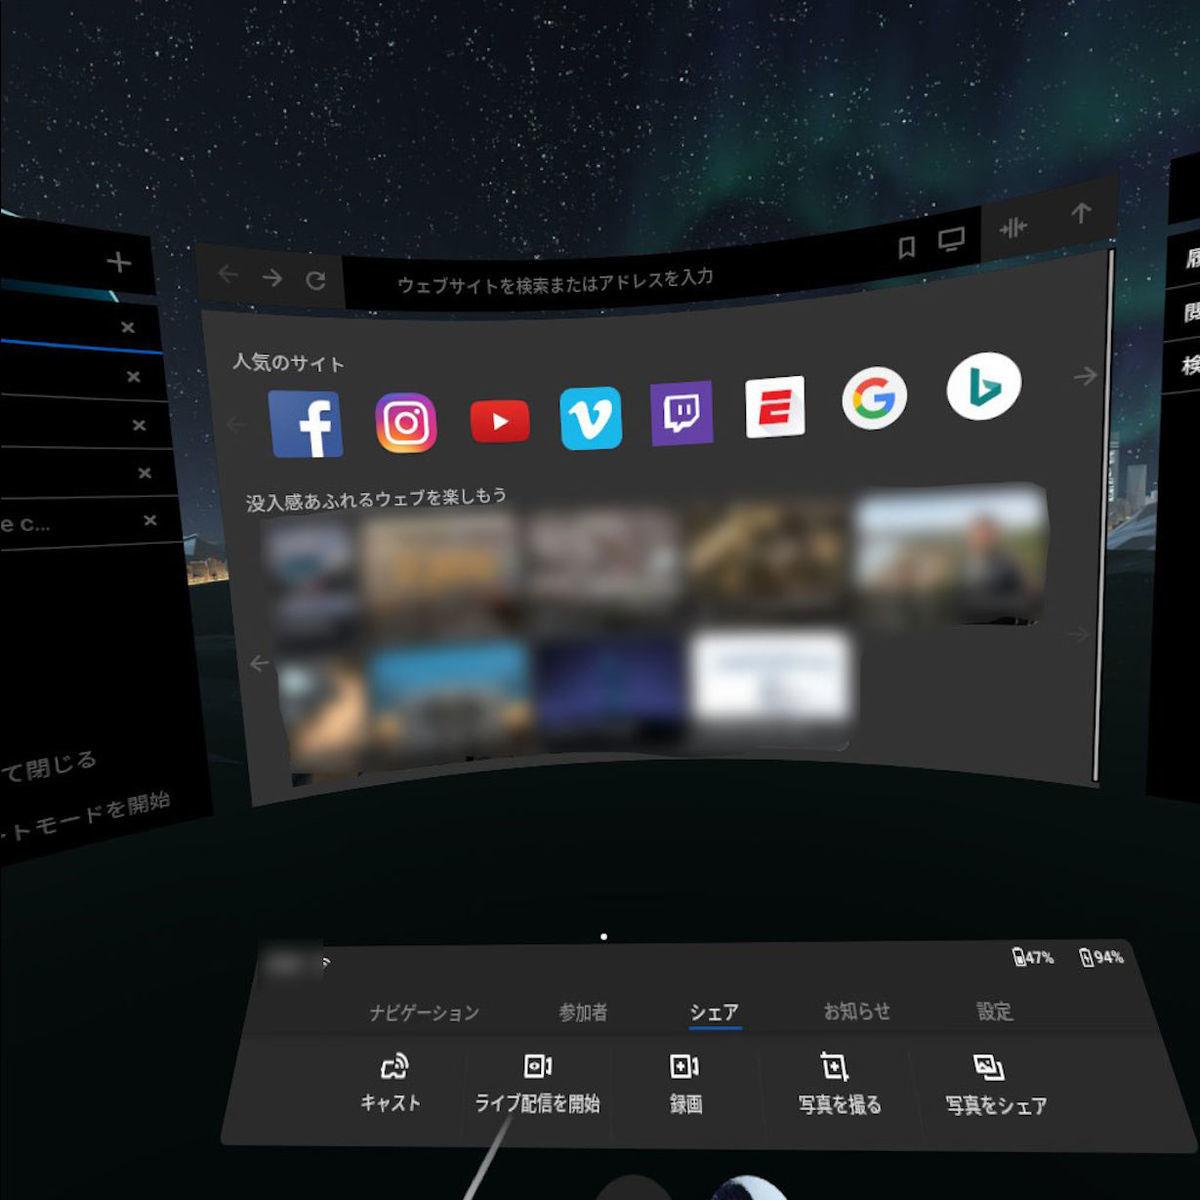 An example screenshot of Oculus browser on Oculus Go